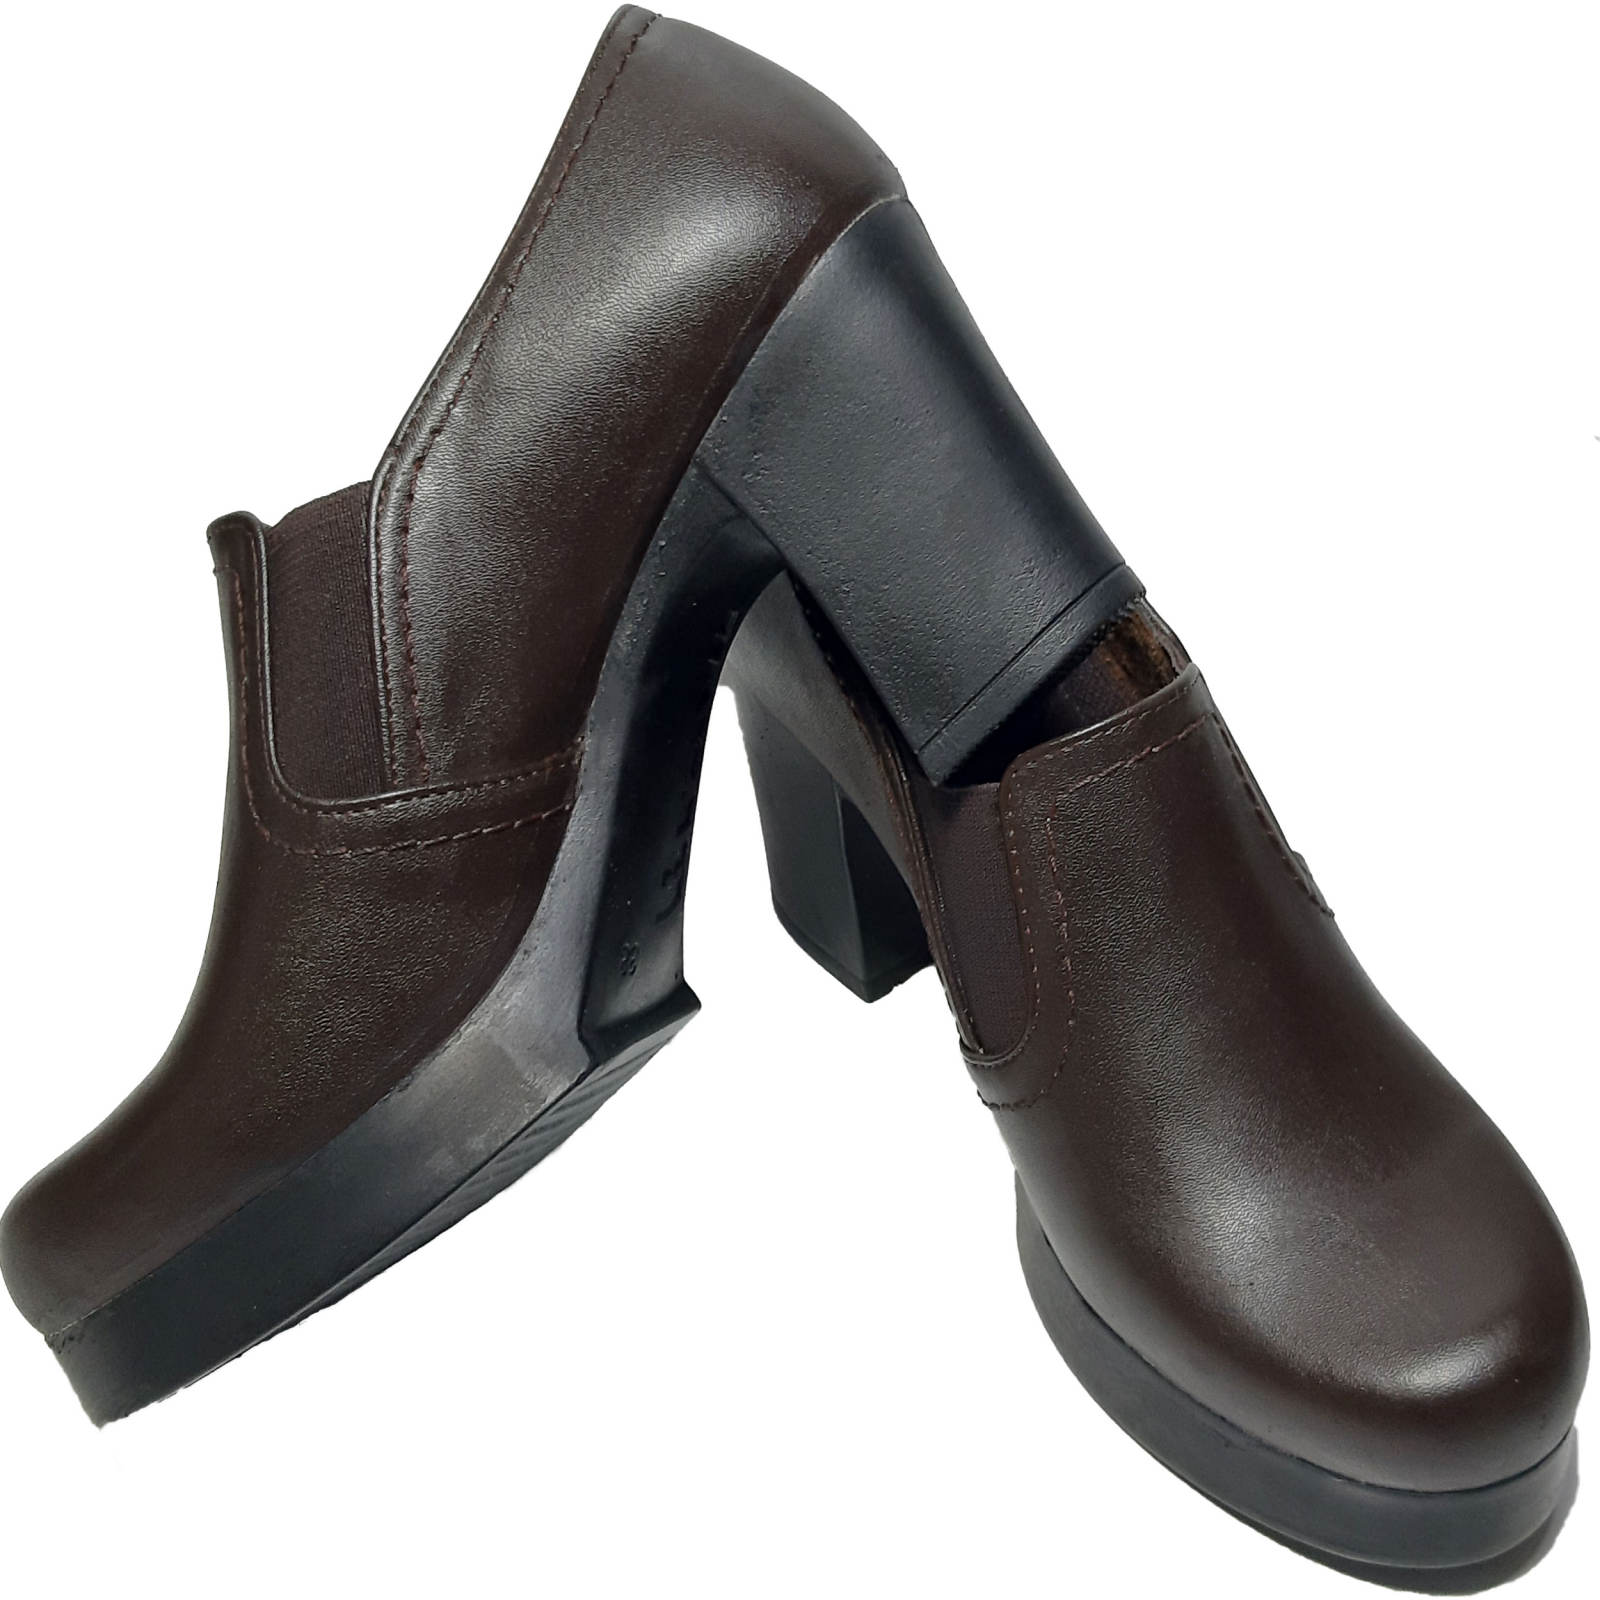 کفش زنانه مدل پرنس -  - 4